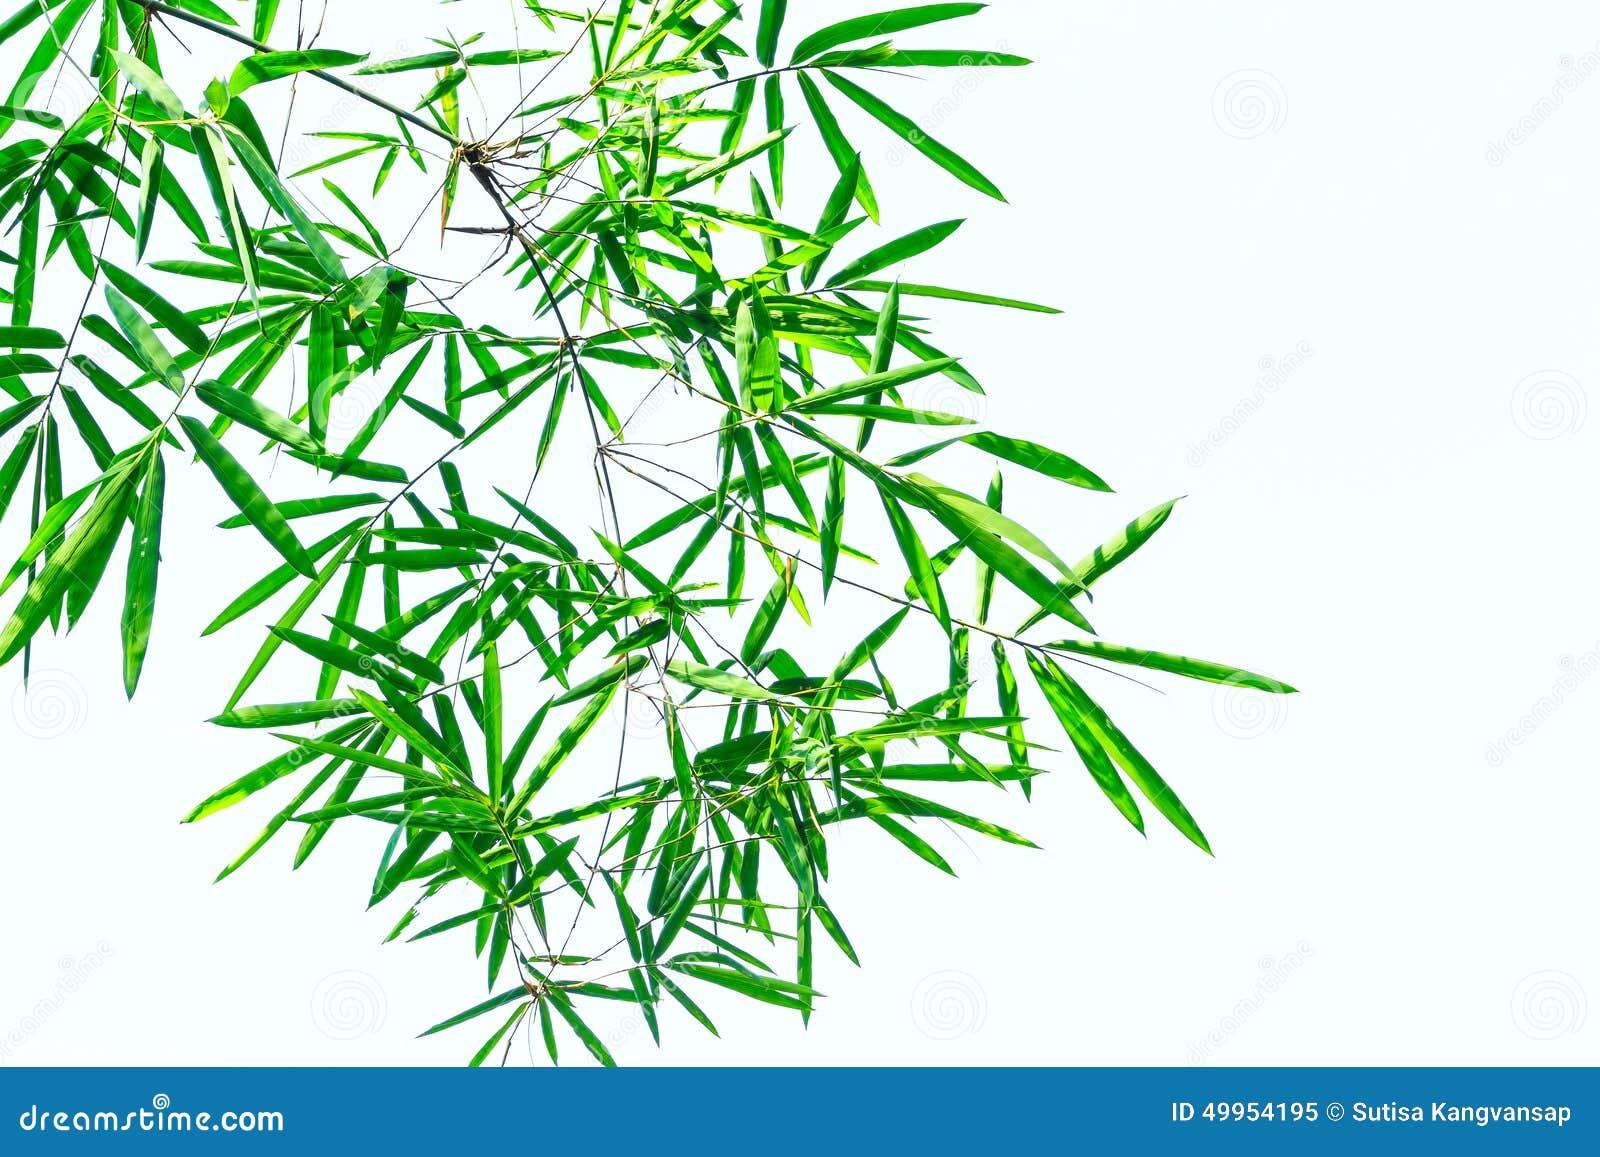 feuille en bambou verte l 39 arri re plan blanc photo stock image 49954195. Black Bedroom Furniture Sets. Home Design Ideas